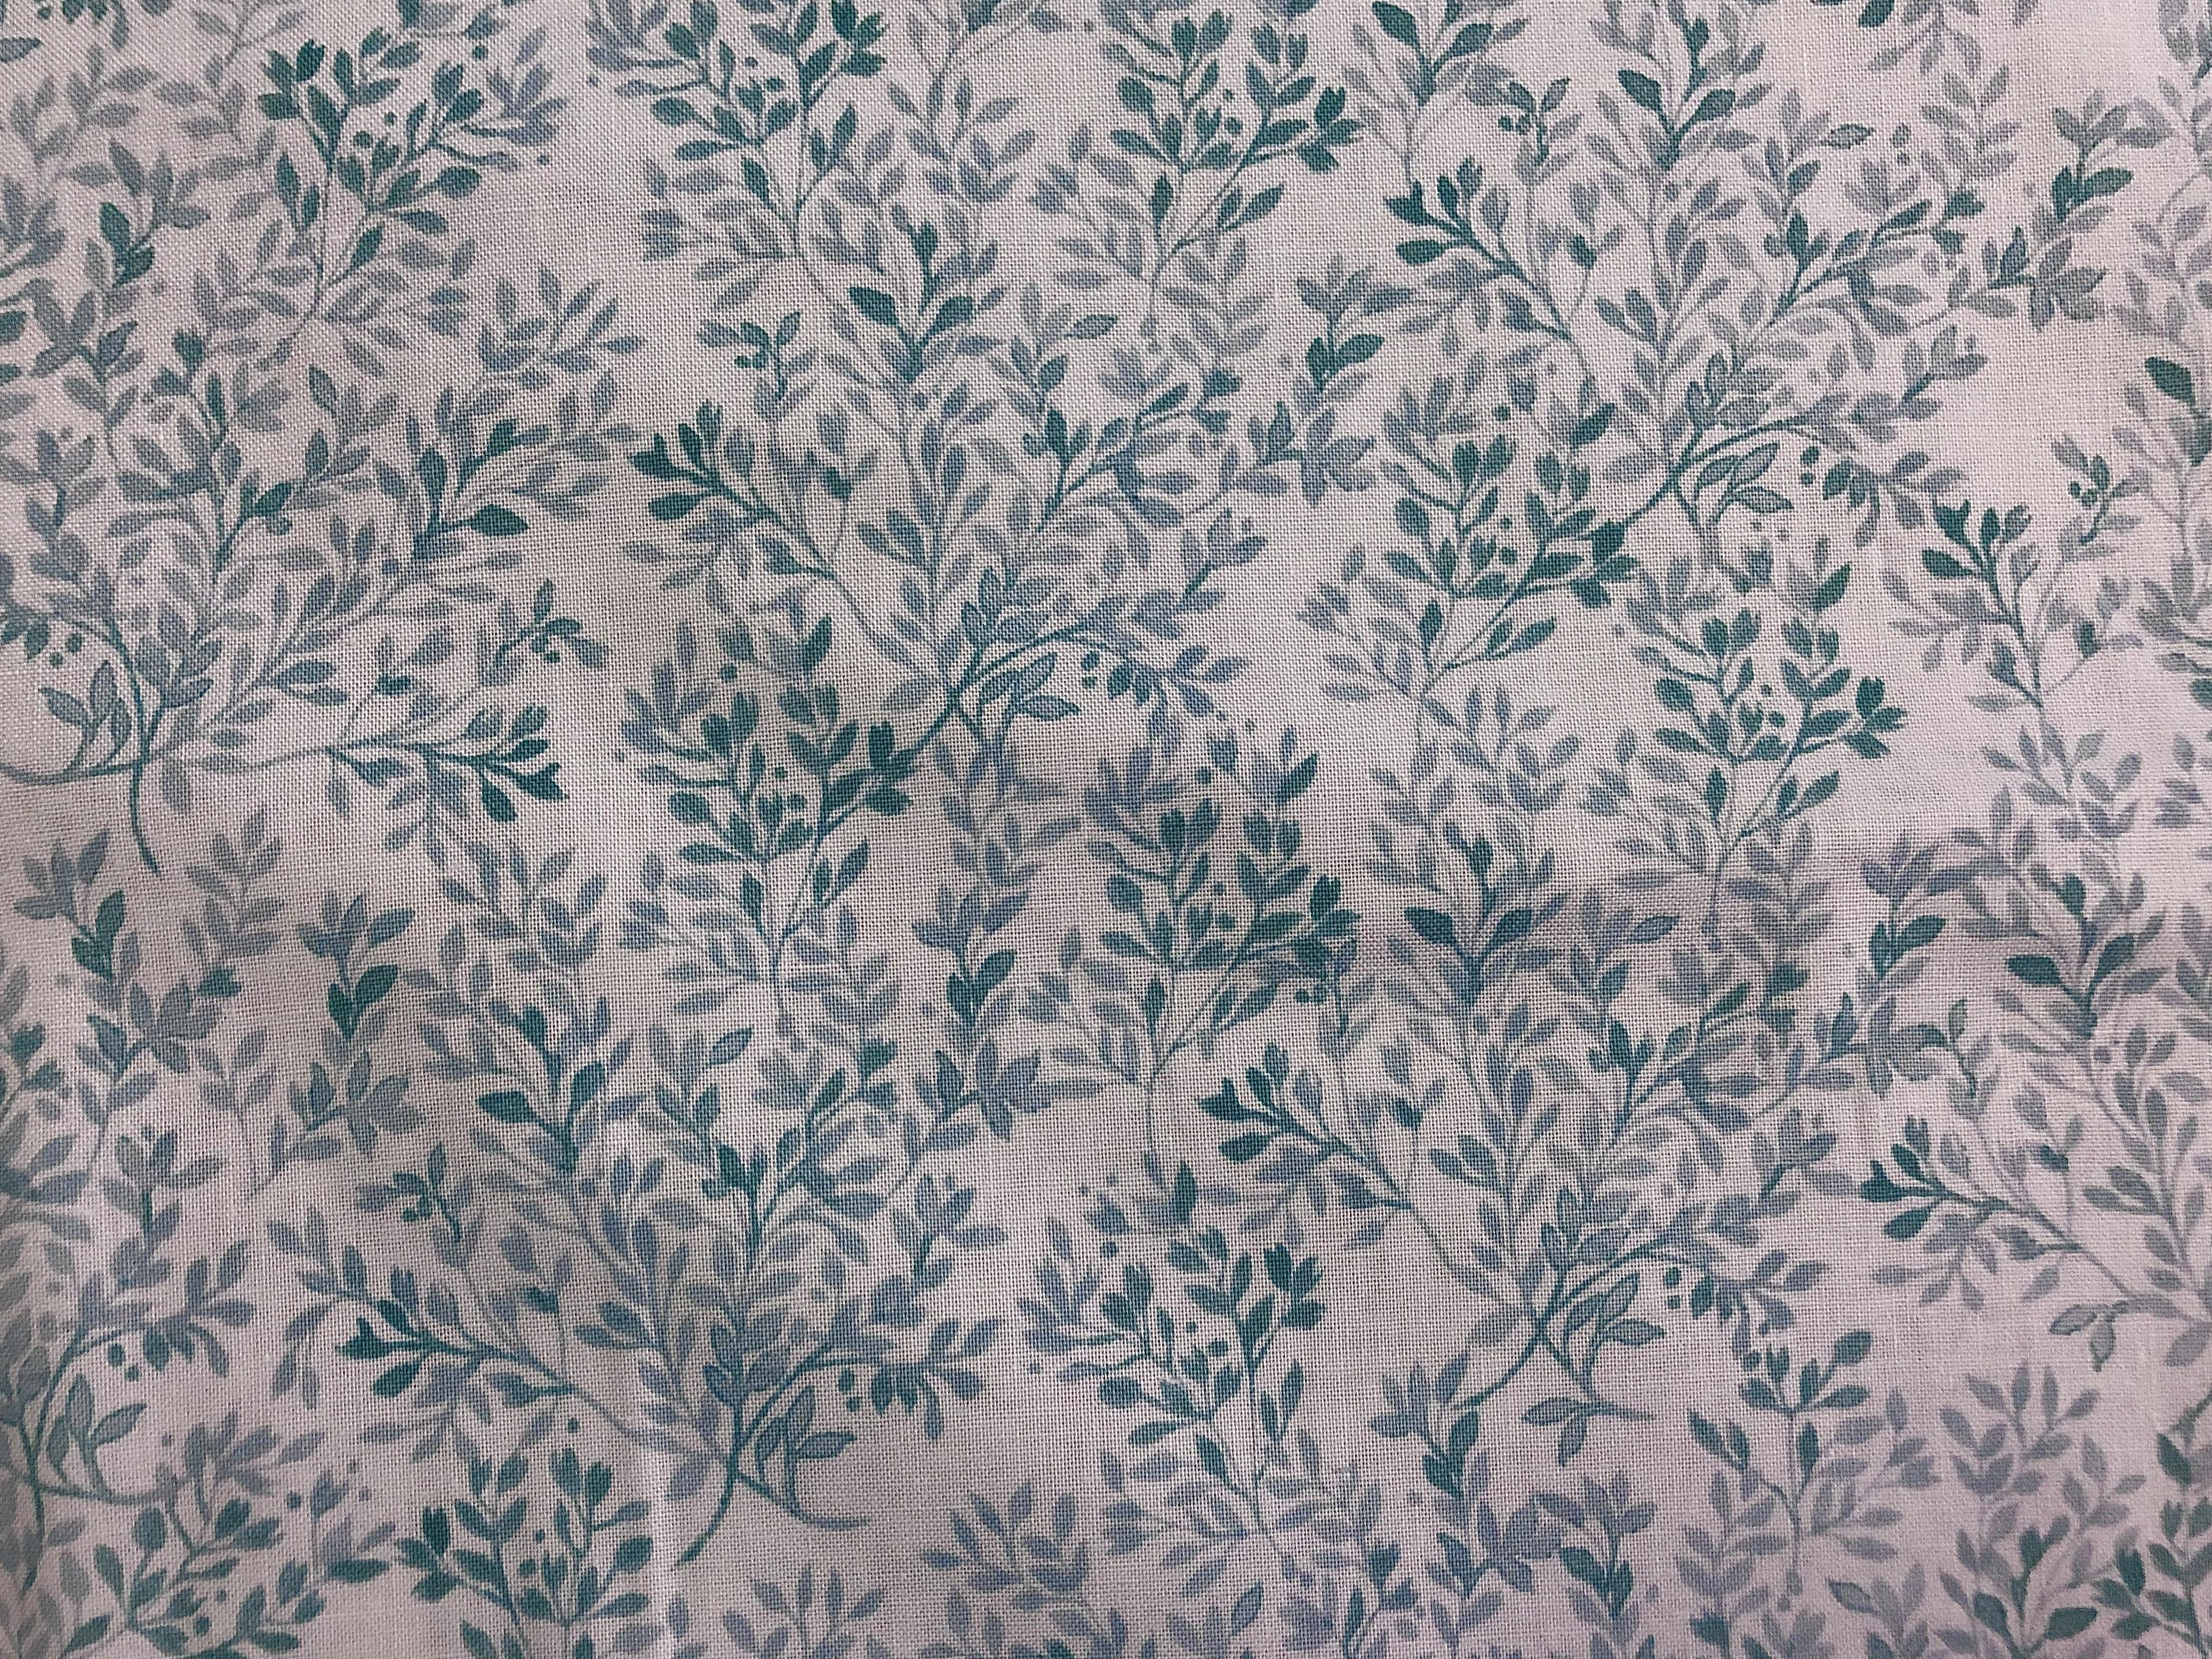 Bird Song - Windham Fabrics - 1/2m cut 56351